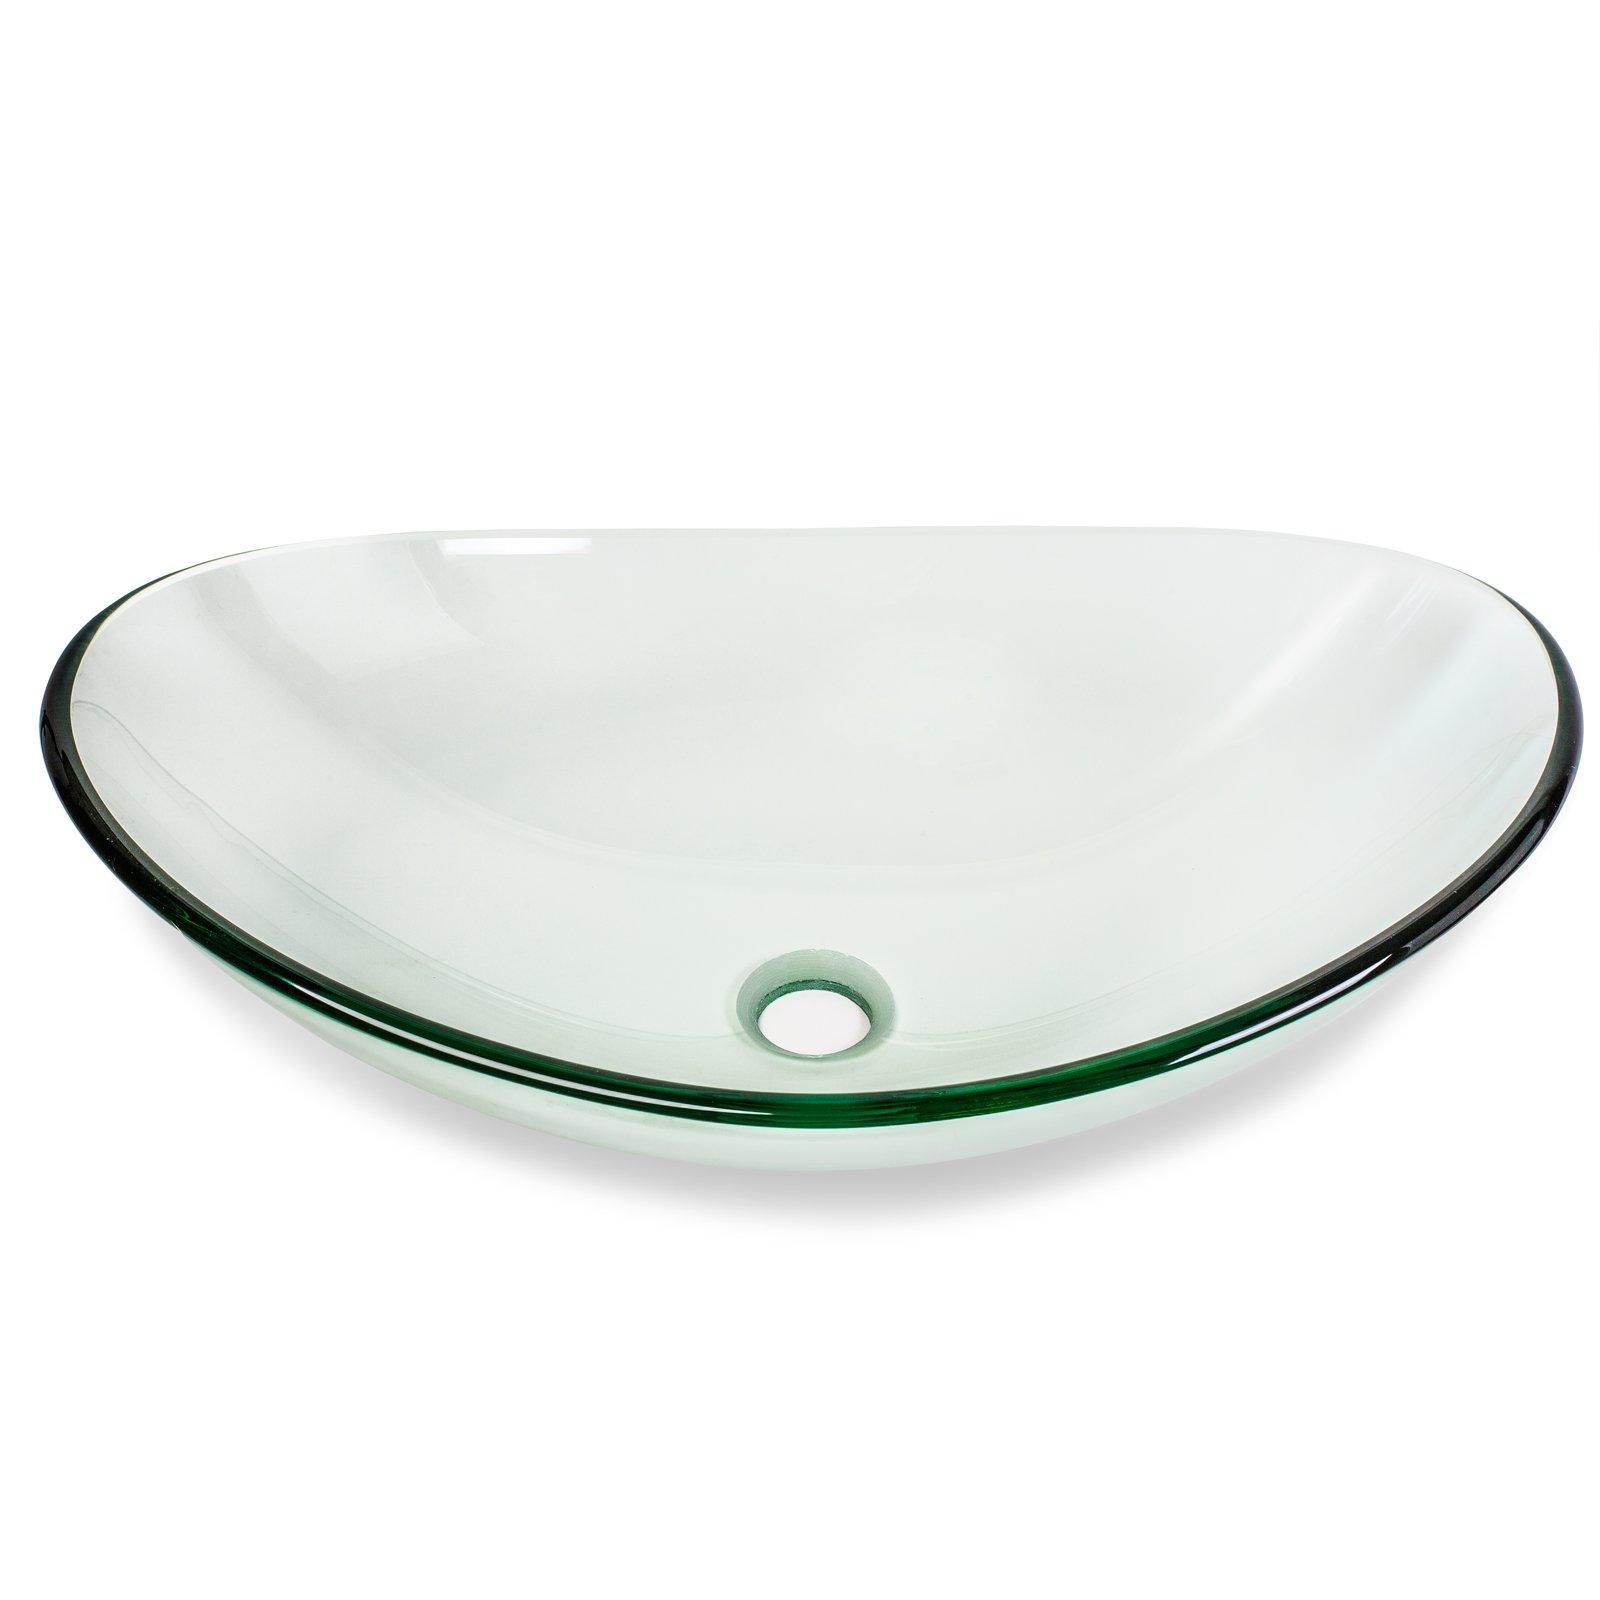 Miligoré Modern Glass Vessel Sink - Above Counter Bathroom Vanity Basin Bowl - Oval Boat Clear